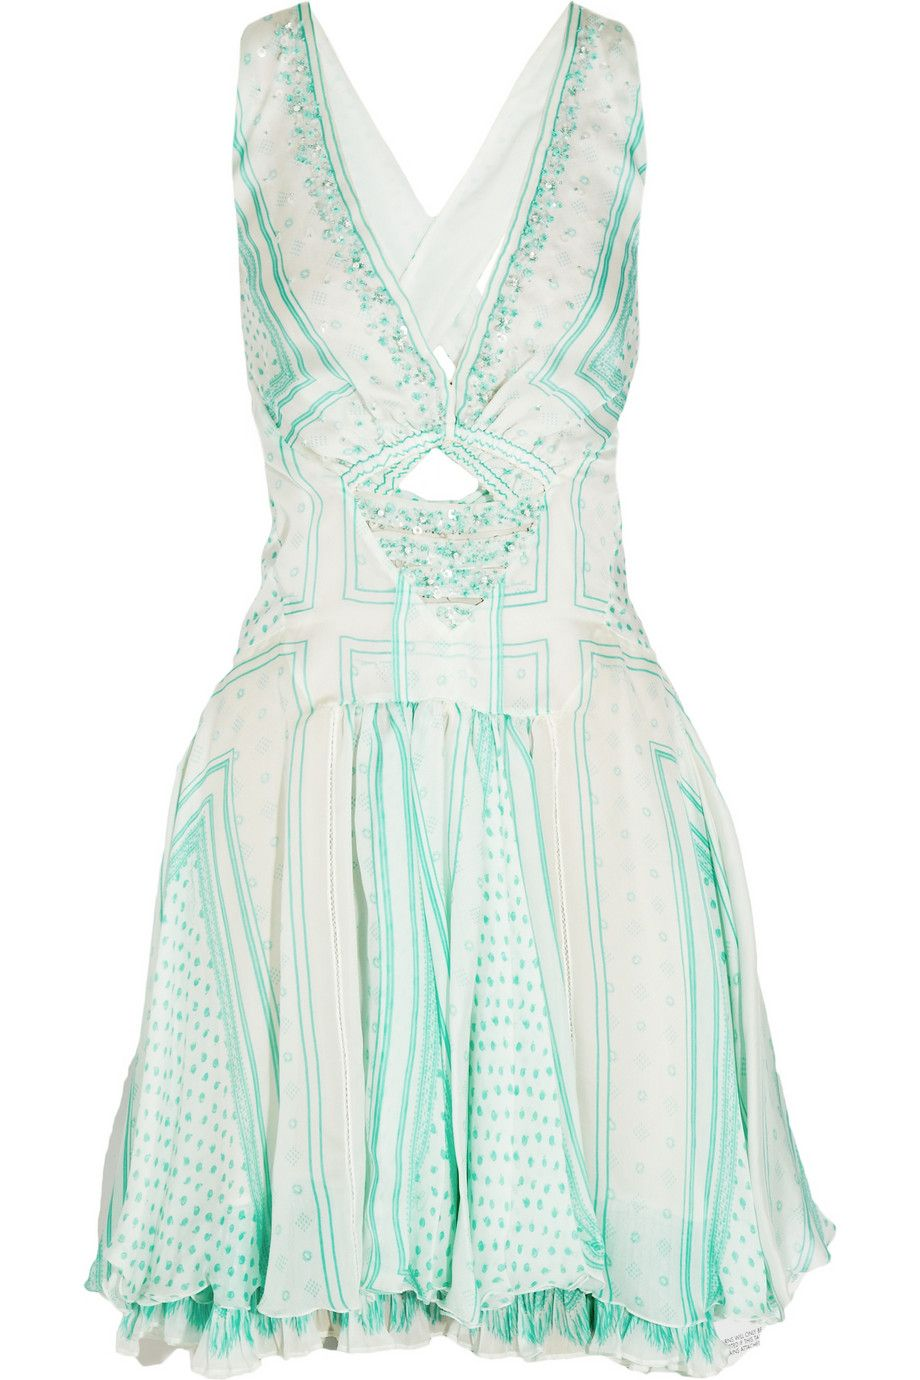 Roberto cavalli printed embellished silkchiffon dress off now